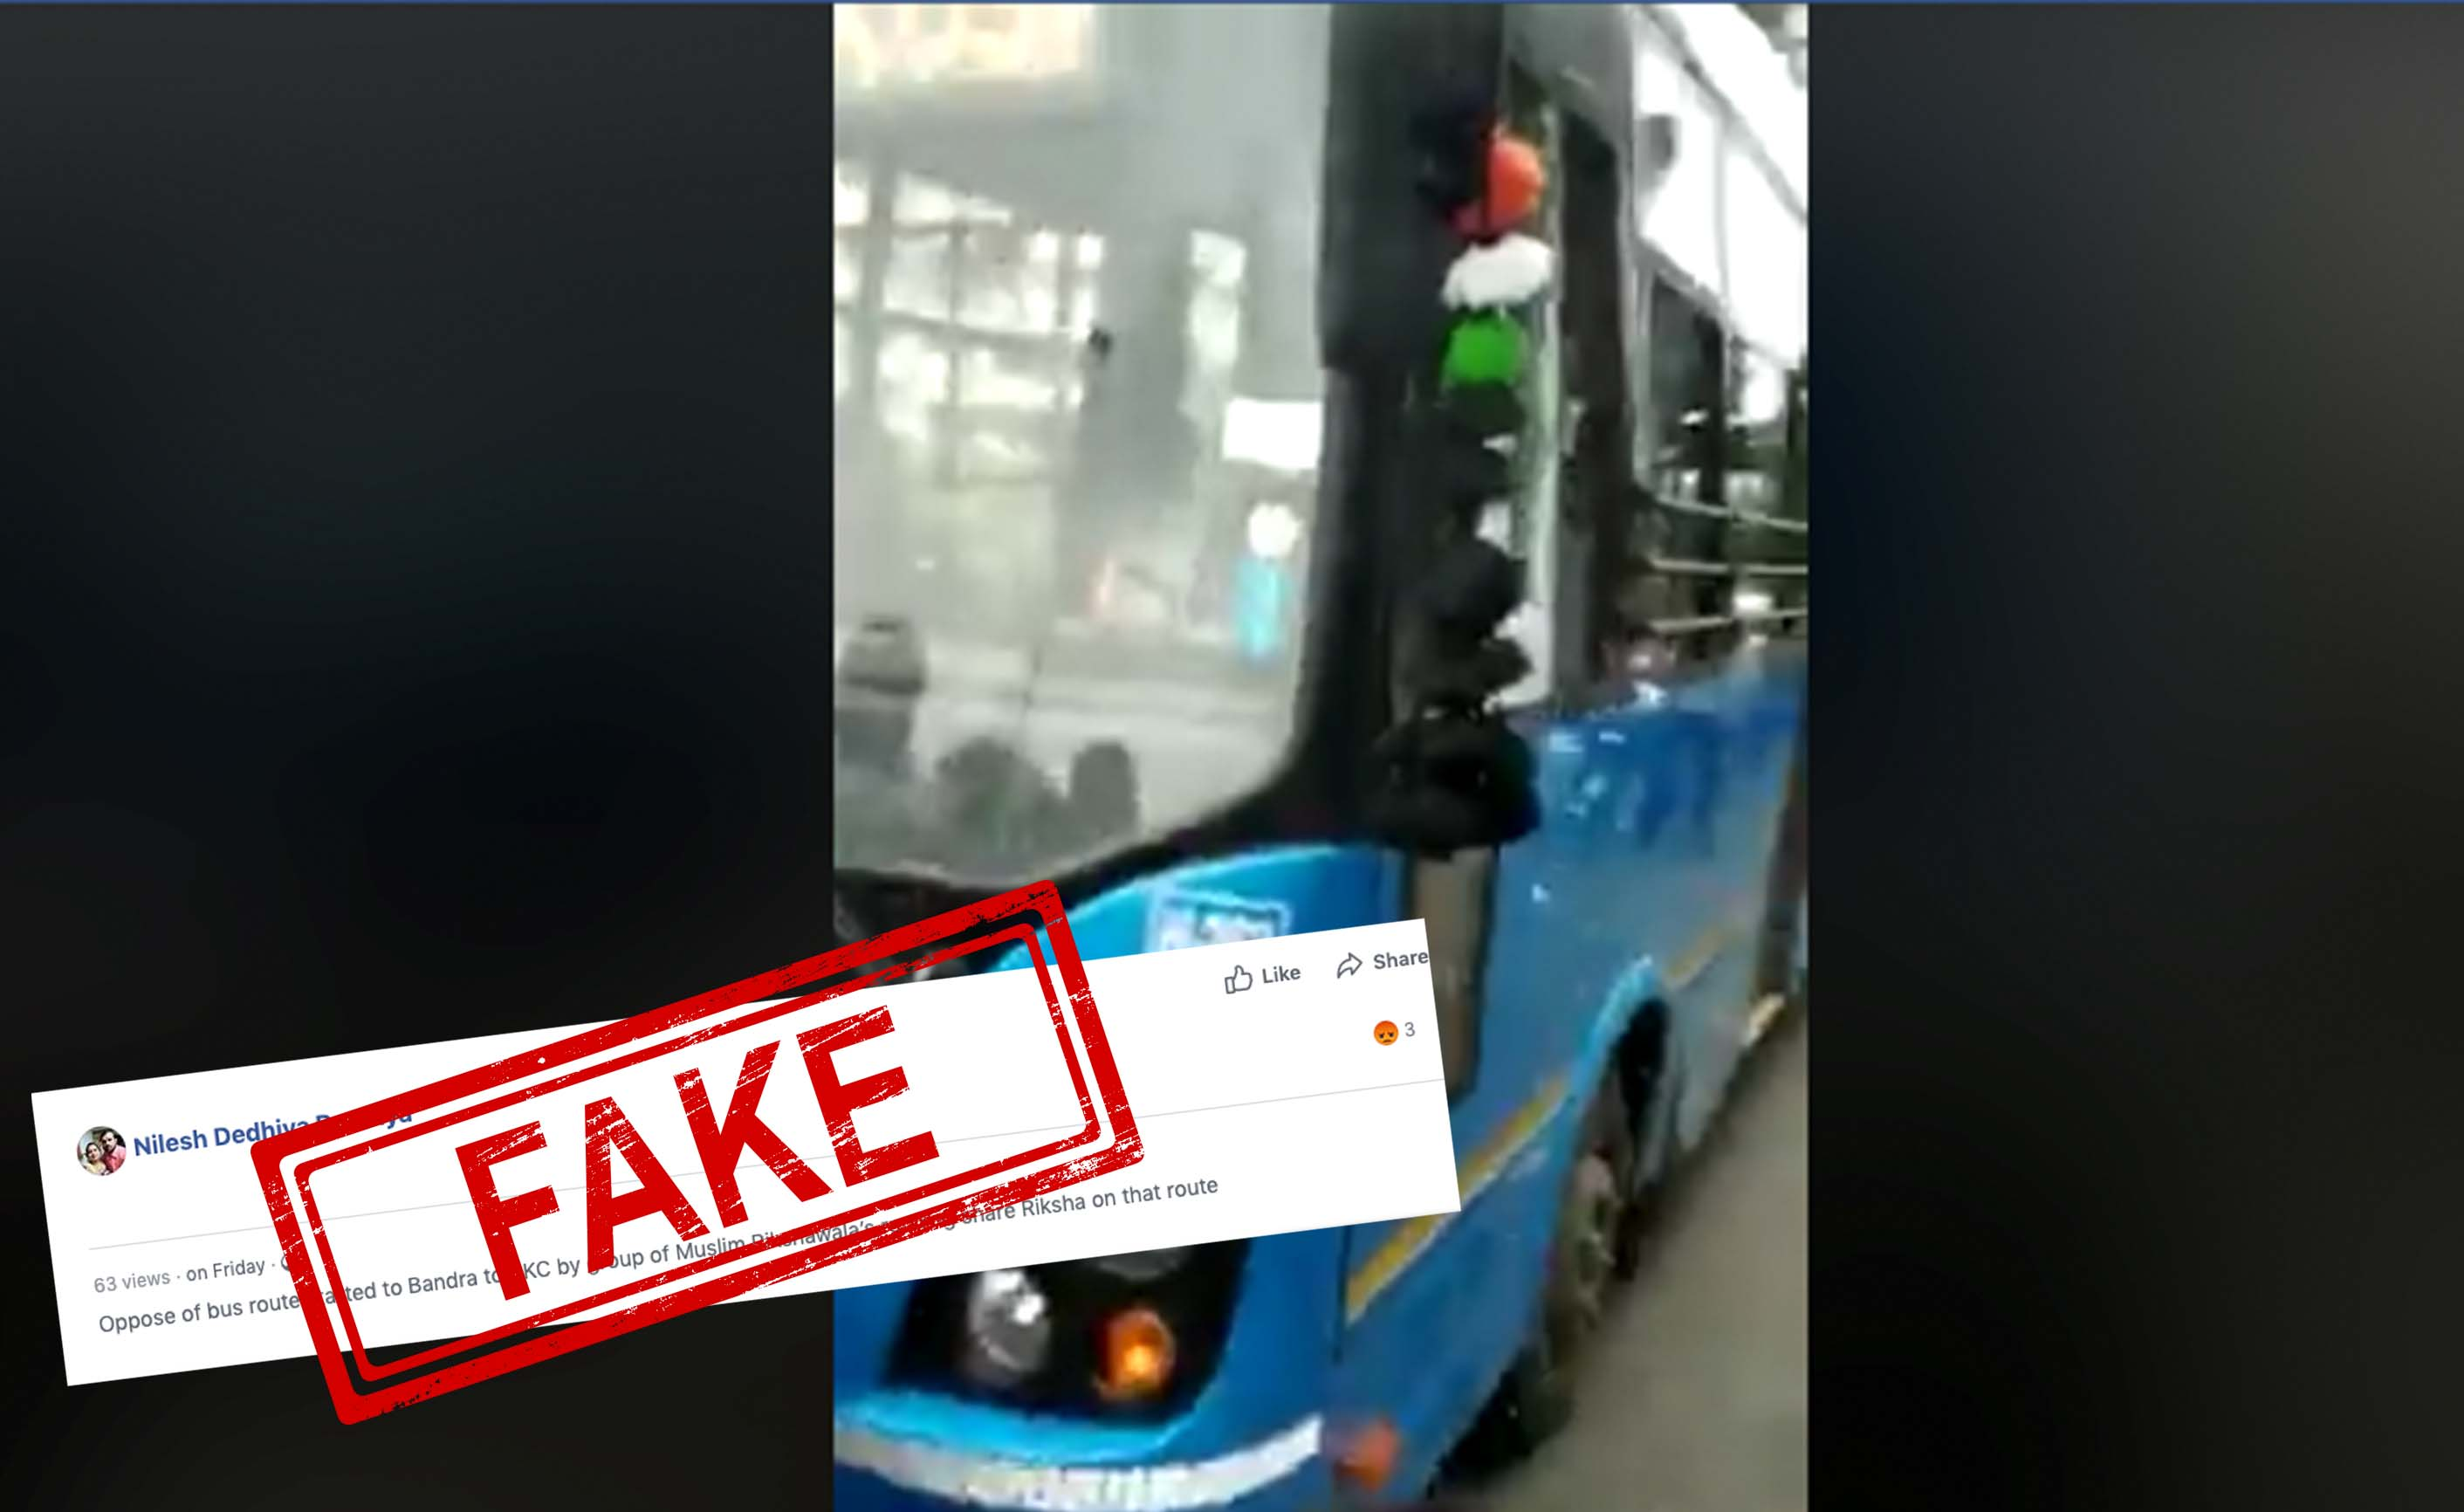 vandalise, Bus, Mumbai, Gujarat, Surat, Video, Mob, FAKE, Fact Check, Fact Checker, NewsMobile, Mobile, News, India